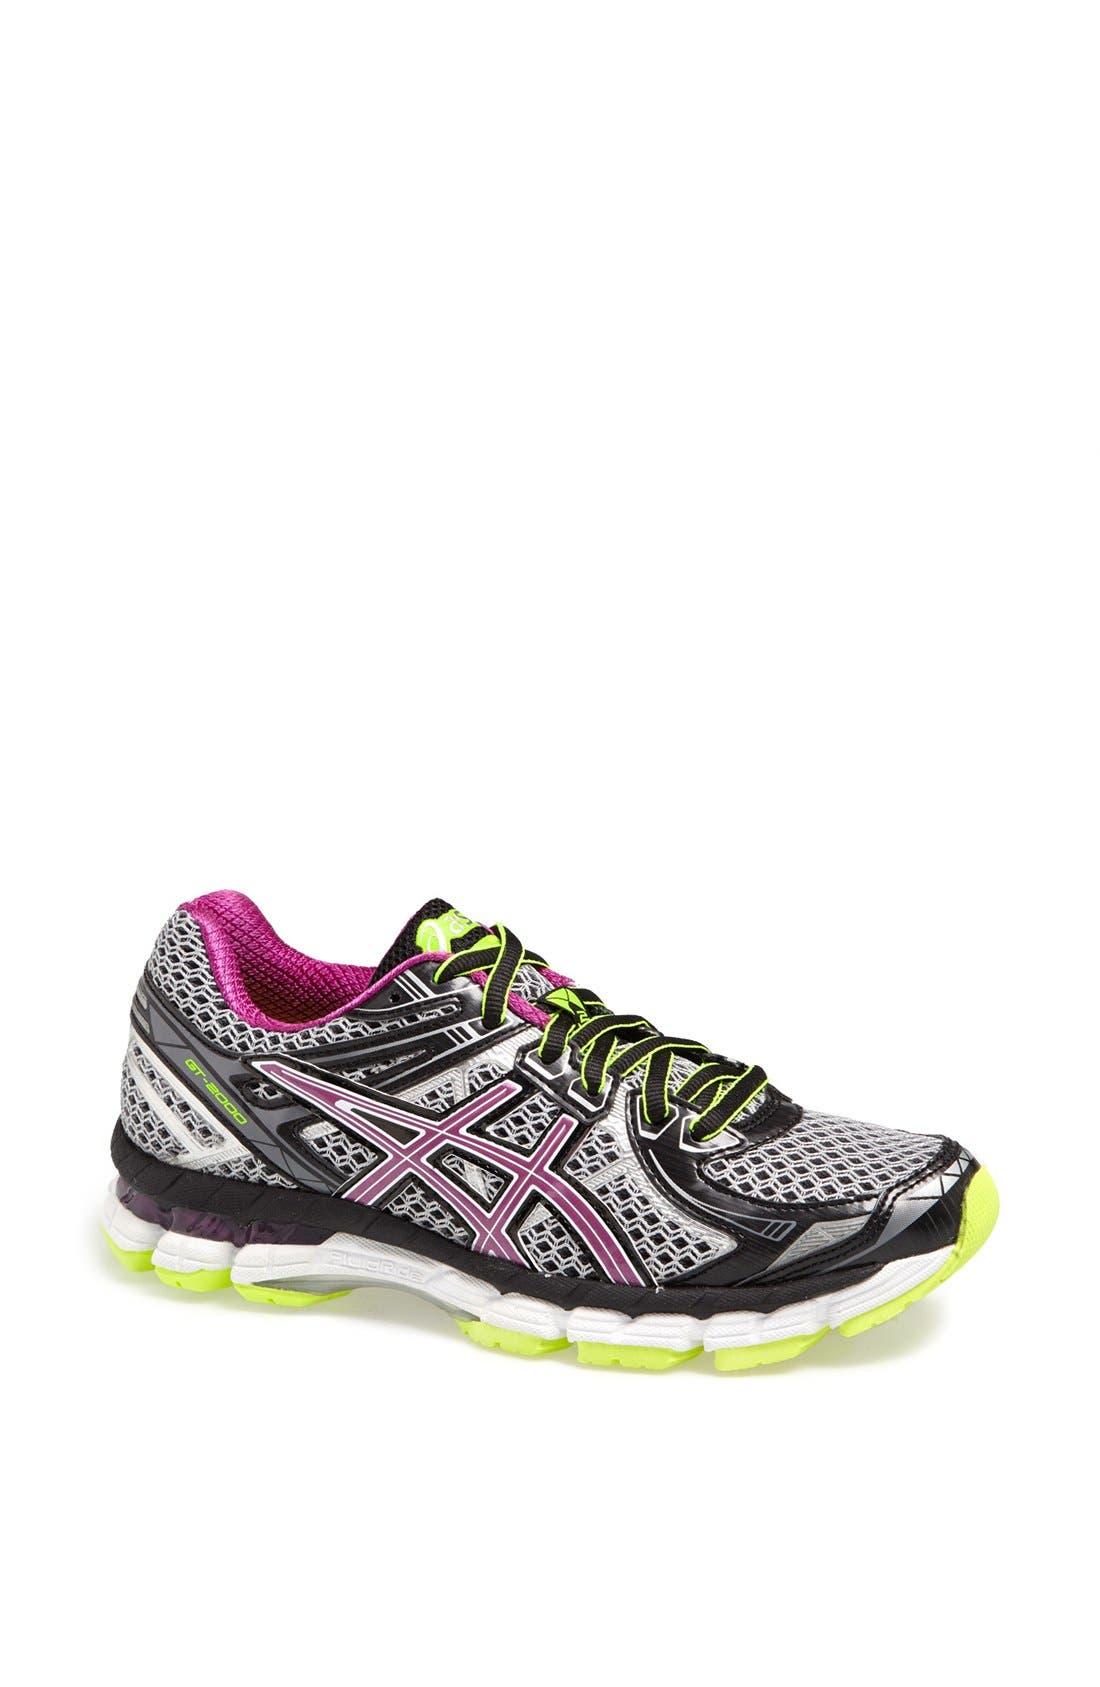 Alternate Image 1 Selected - ASICS® 'GT-2000 2 BR' Running Shoe